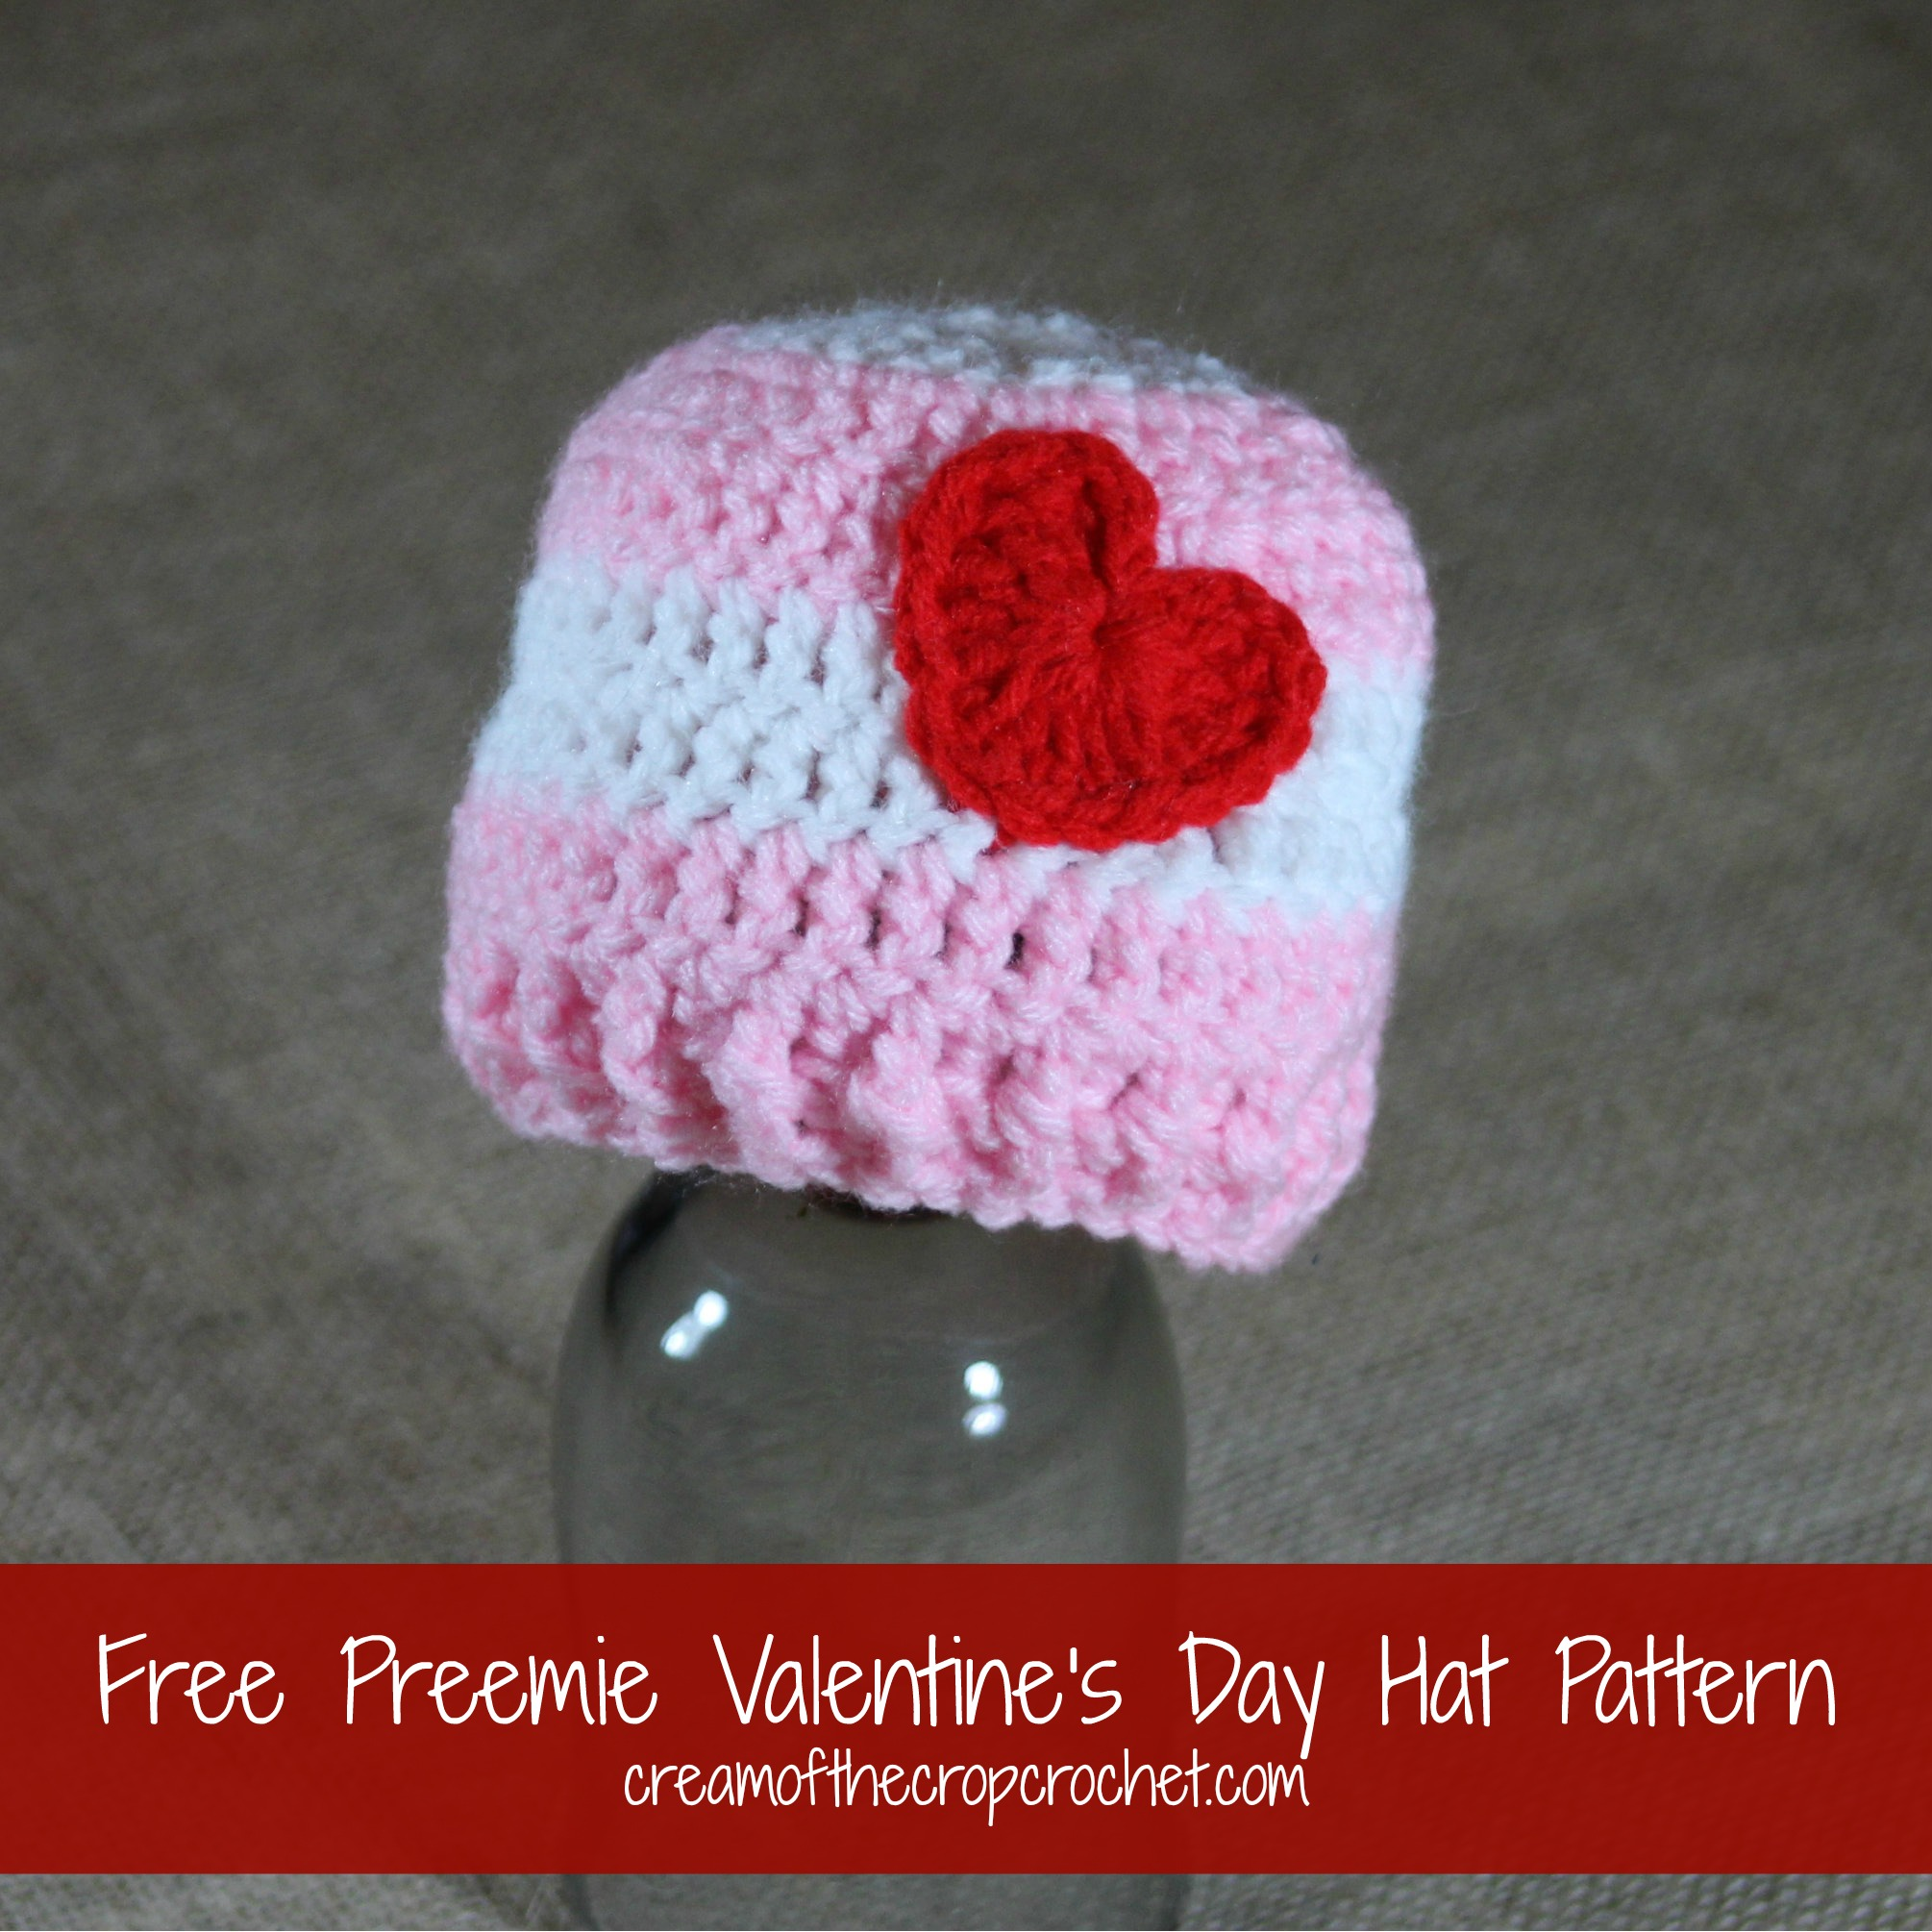 Preemie Newborn Hannah Hat Crochet Pattern Cream Of The Crop Crochet